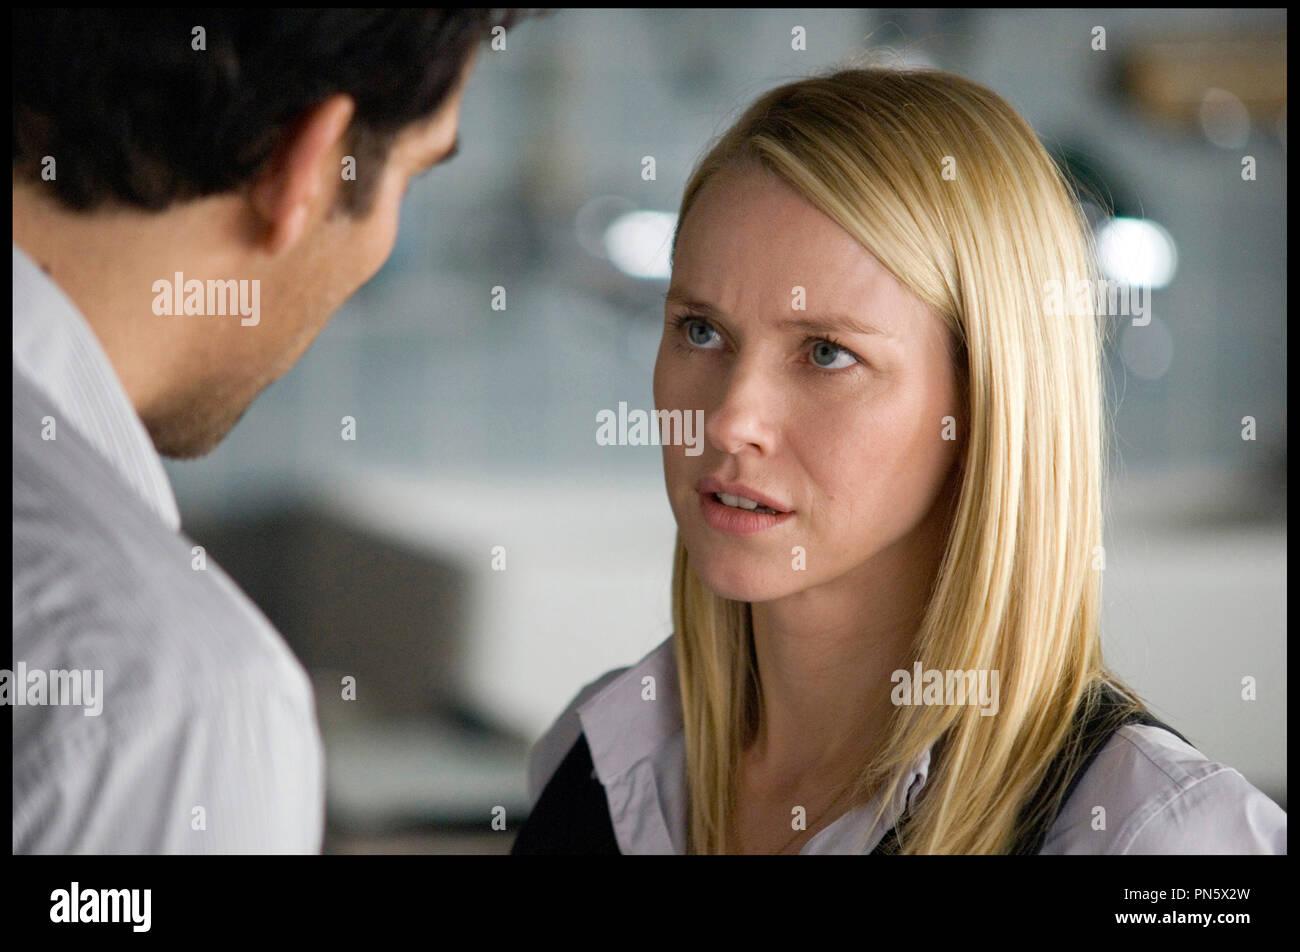 Andrea Kelly (actress),Joy Osmanski XXX pics & movies Marisa Miller United States,Connie Britton